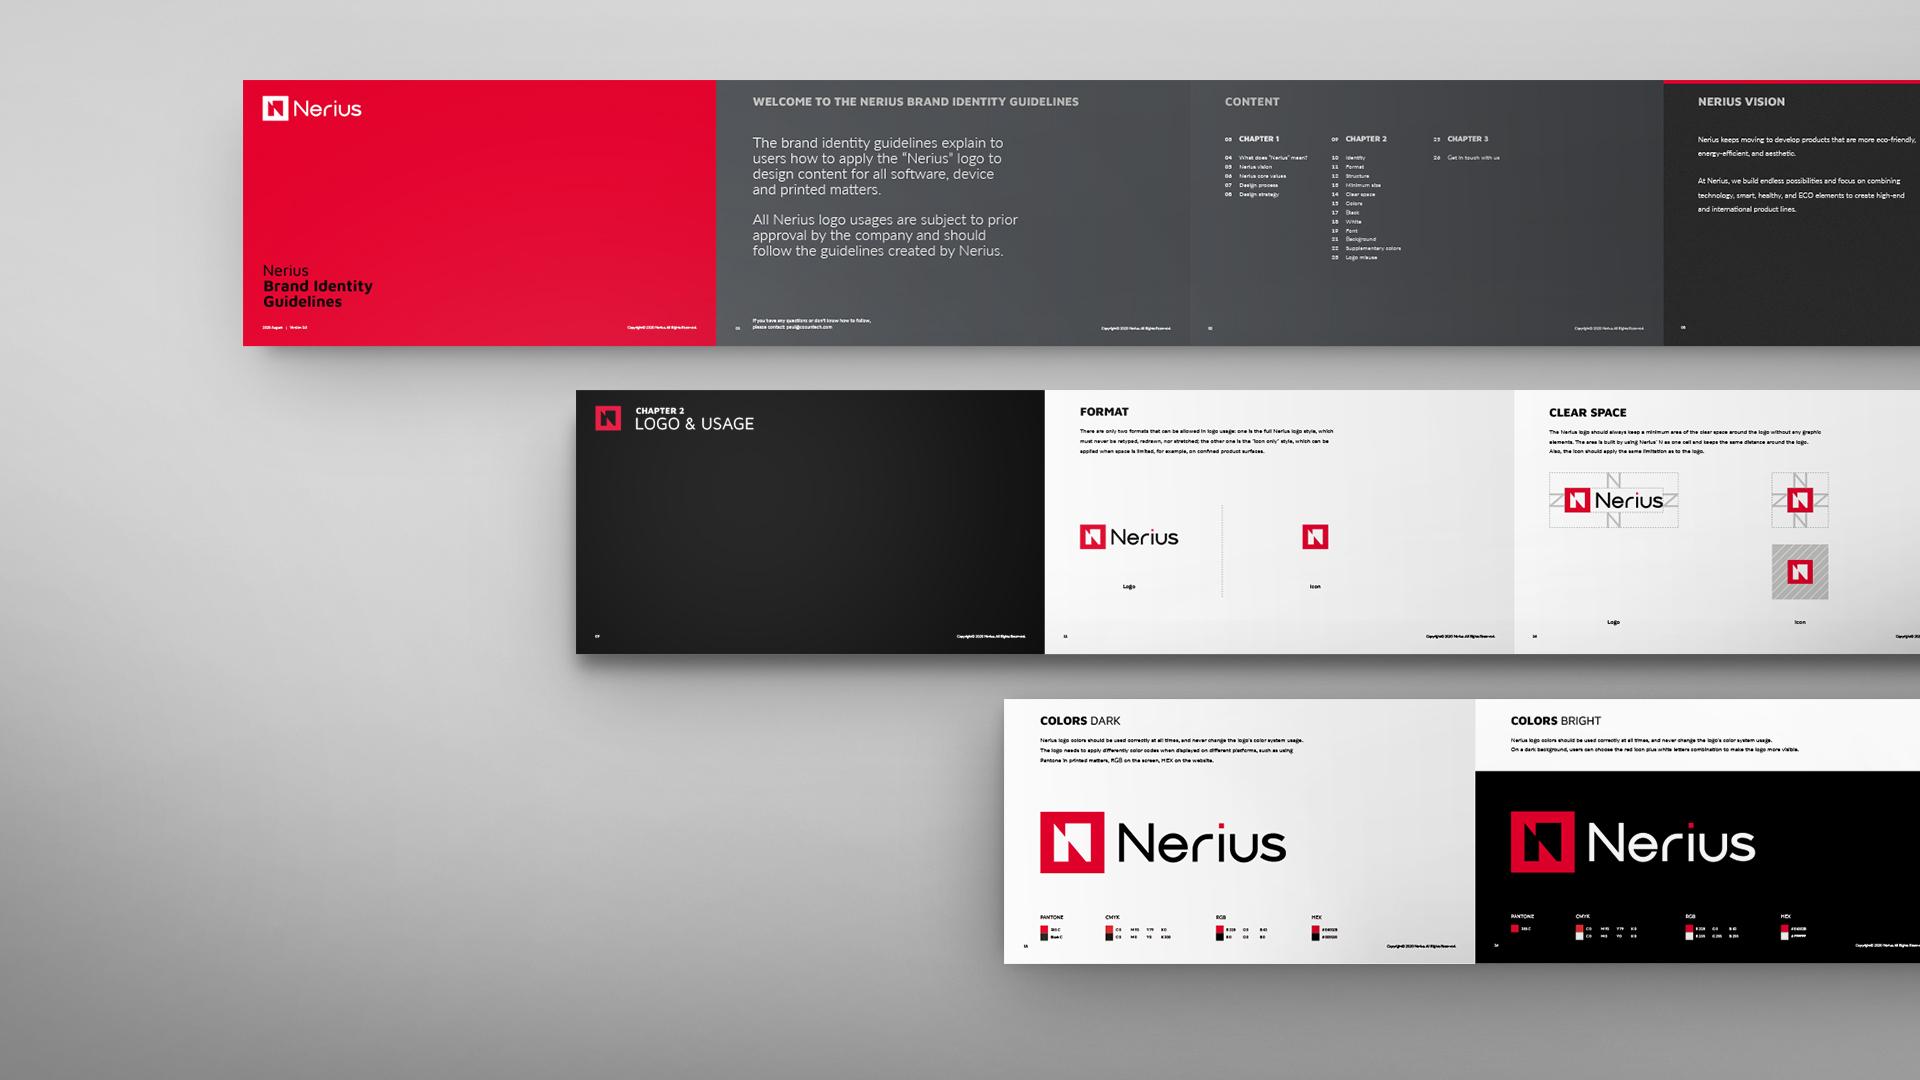 Nerius_Brand_Pic05_1920x1080